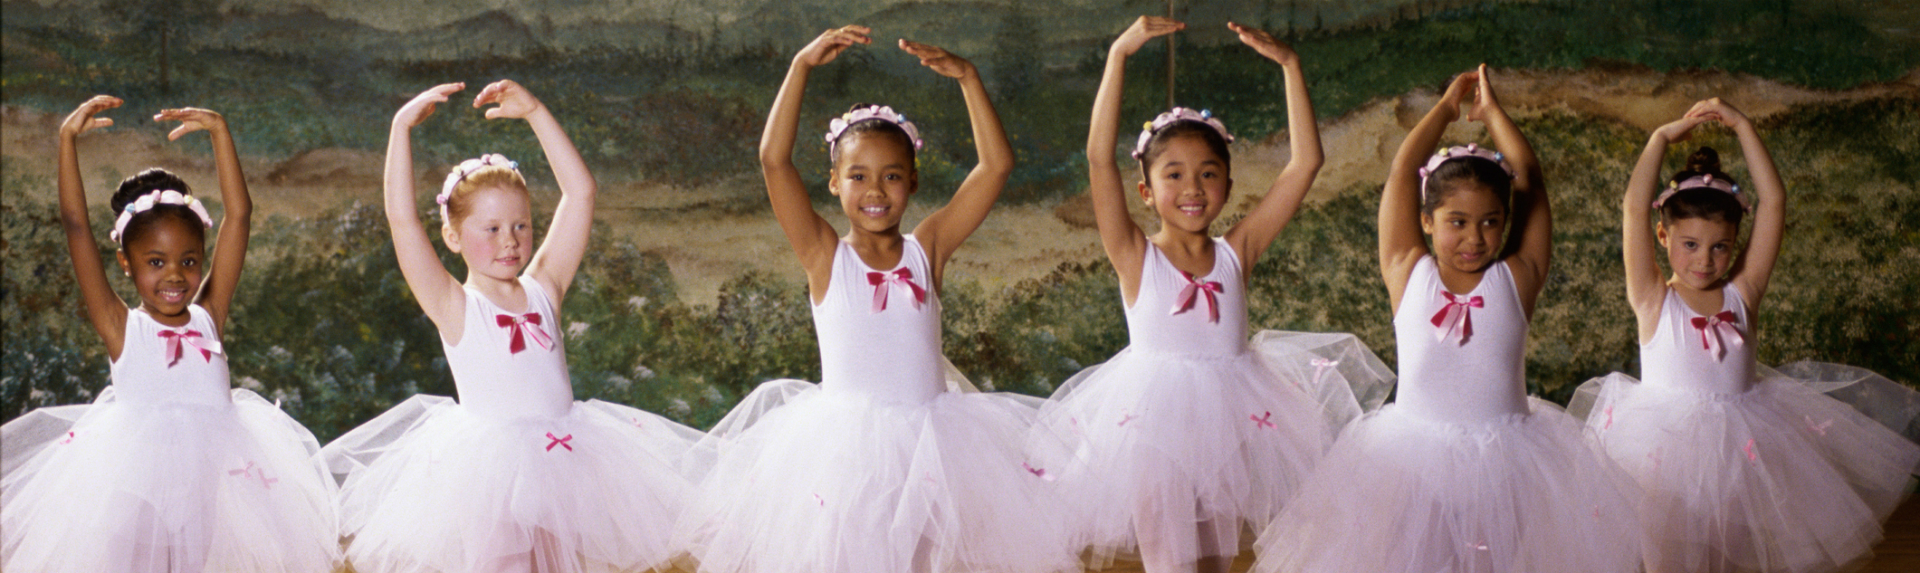 McKinney Dance Academy image 6